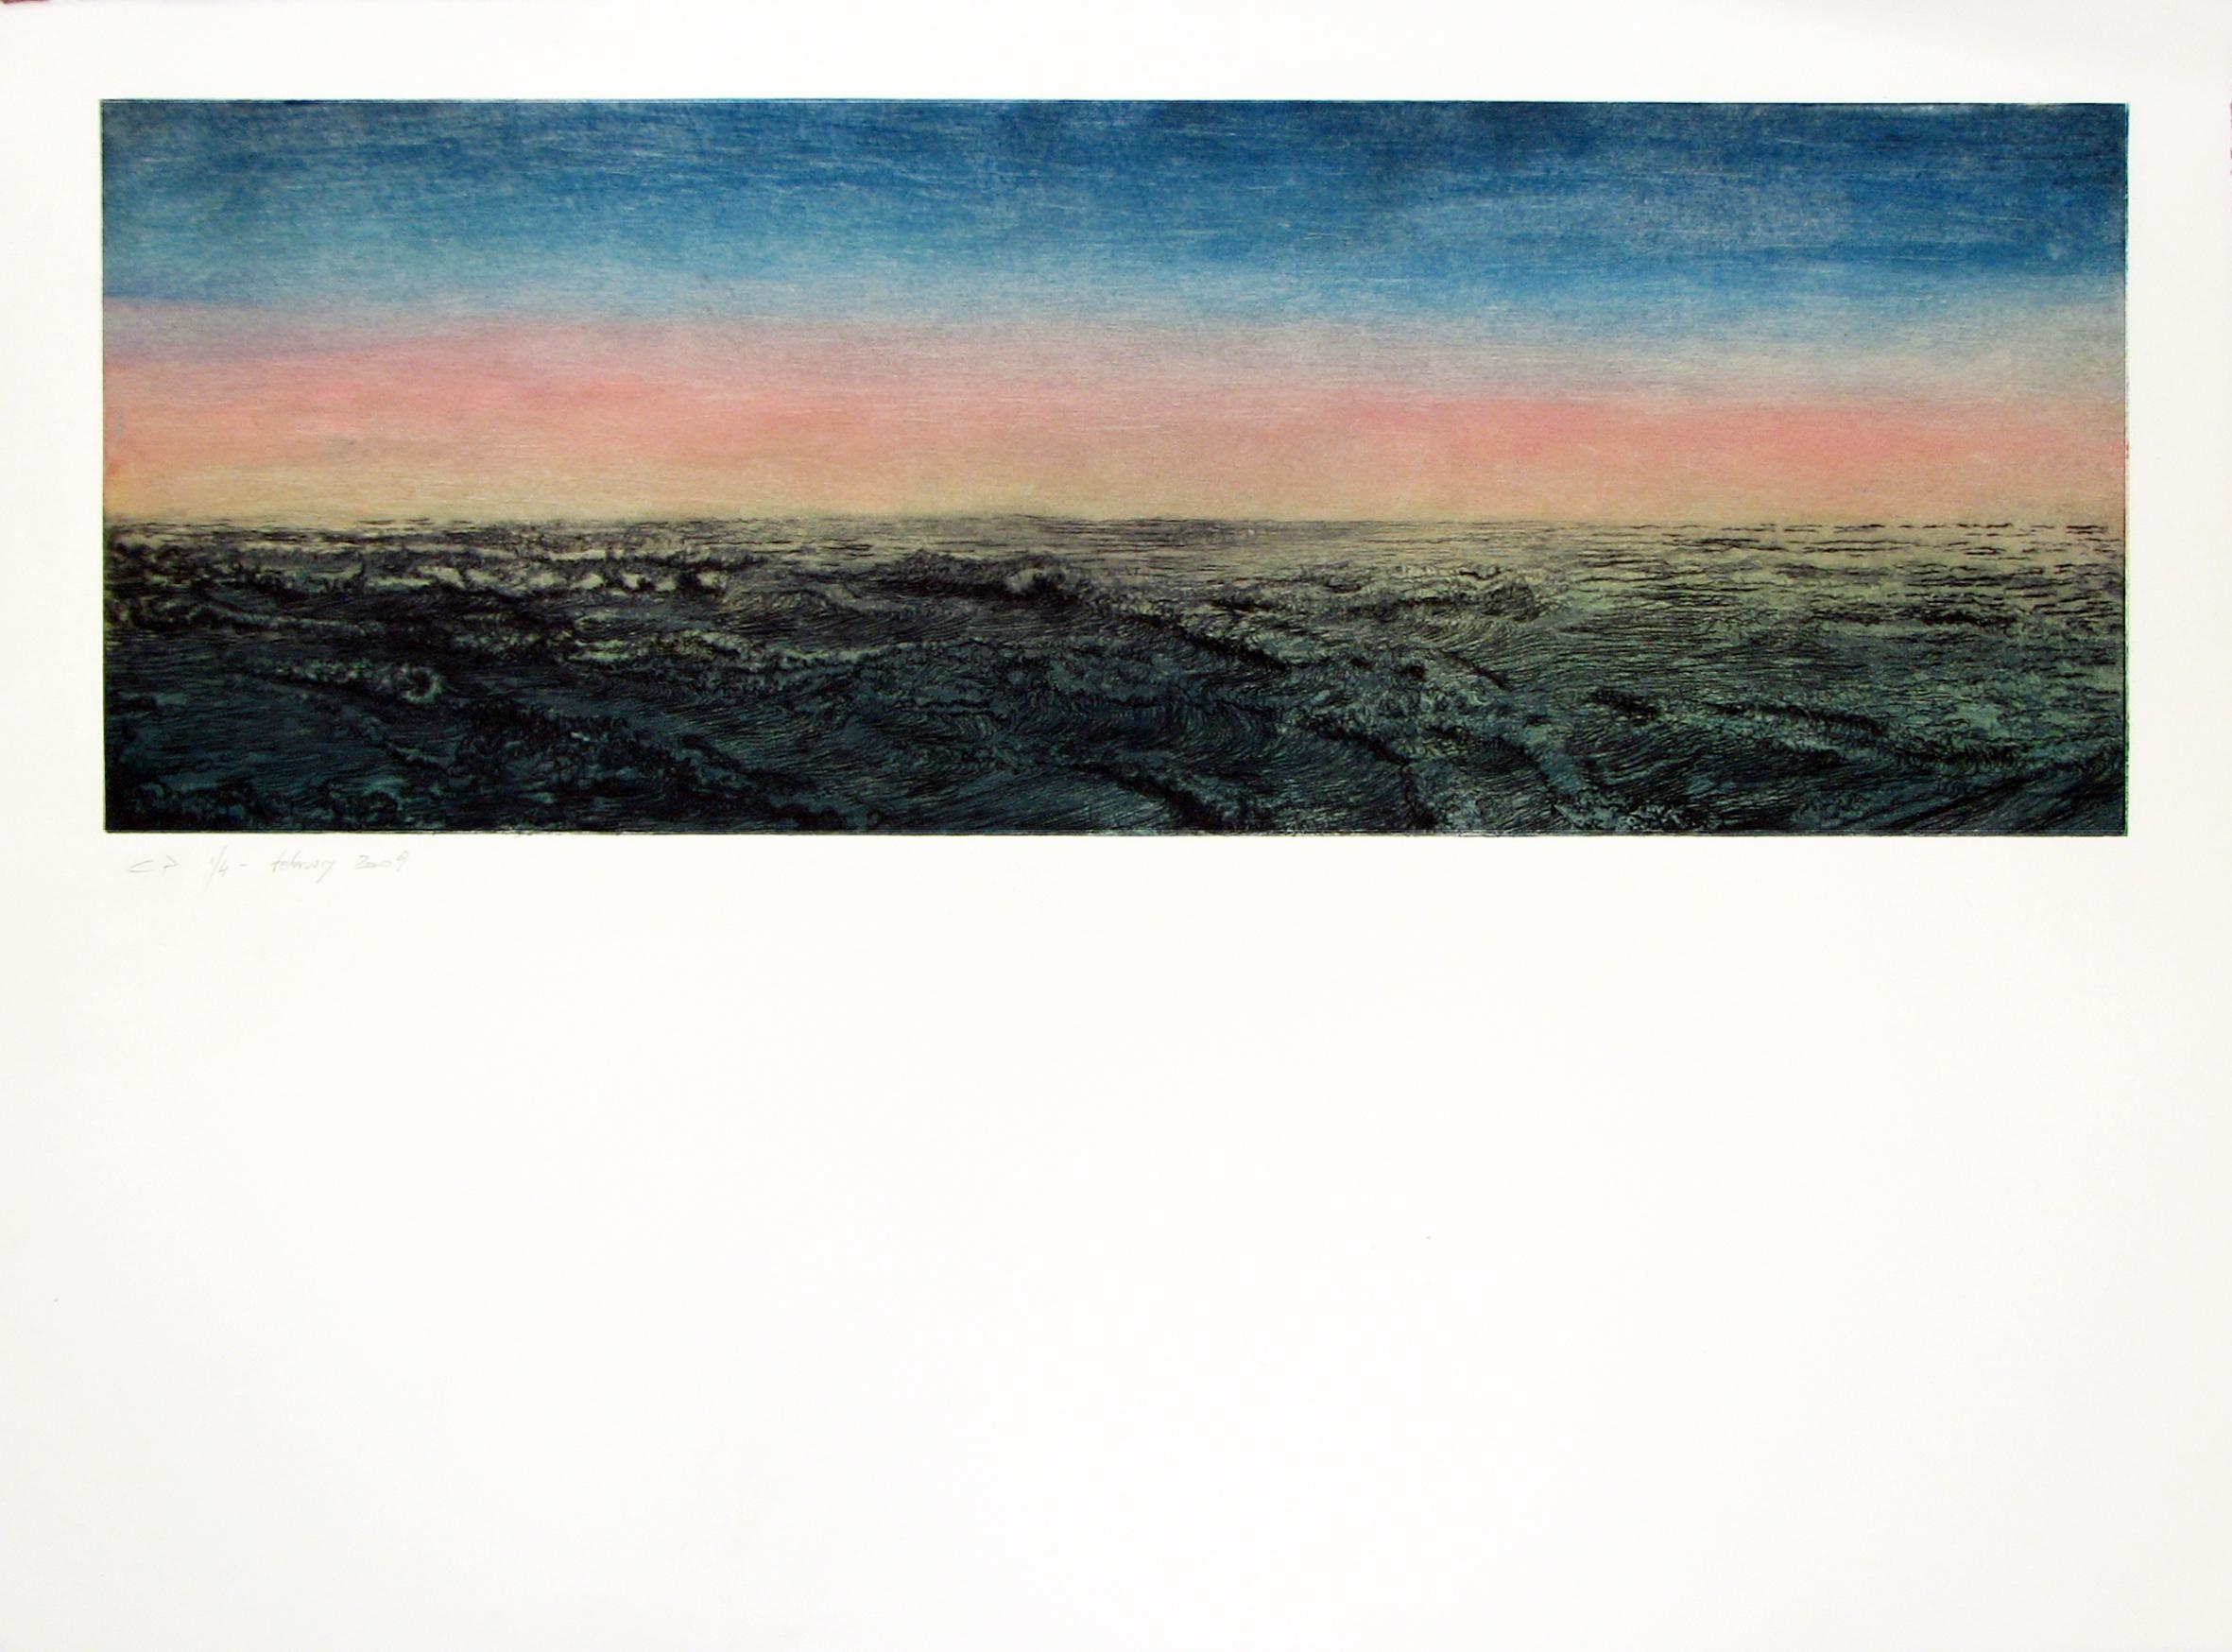 Sunset - 2009